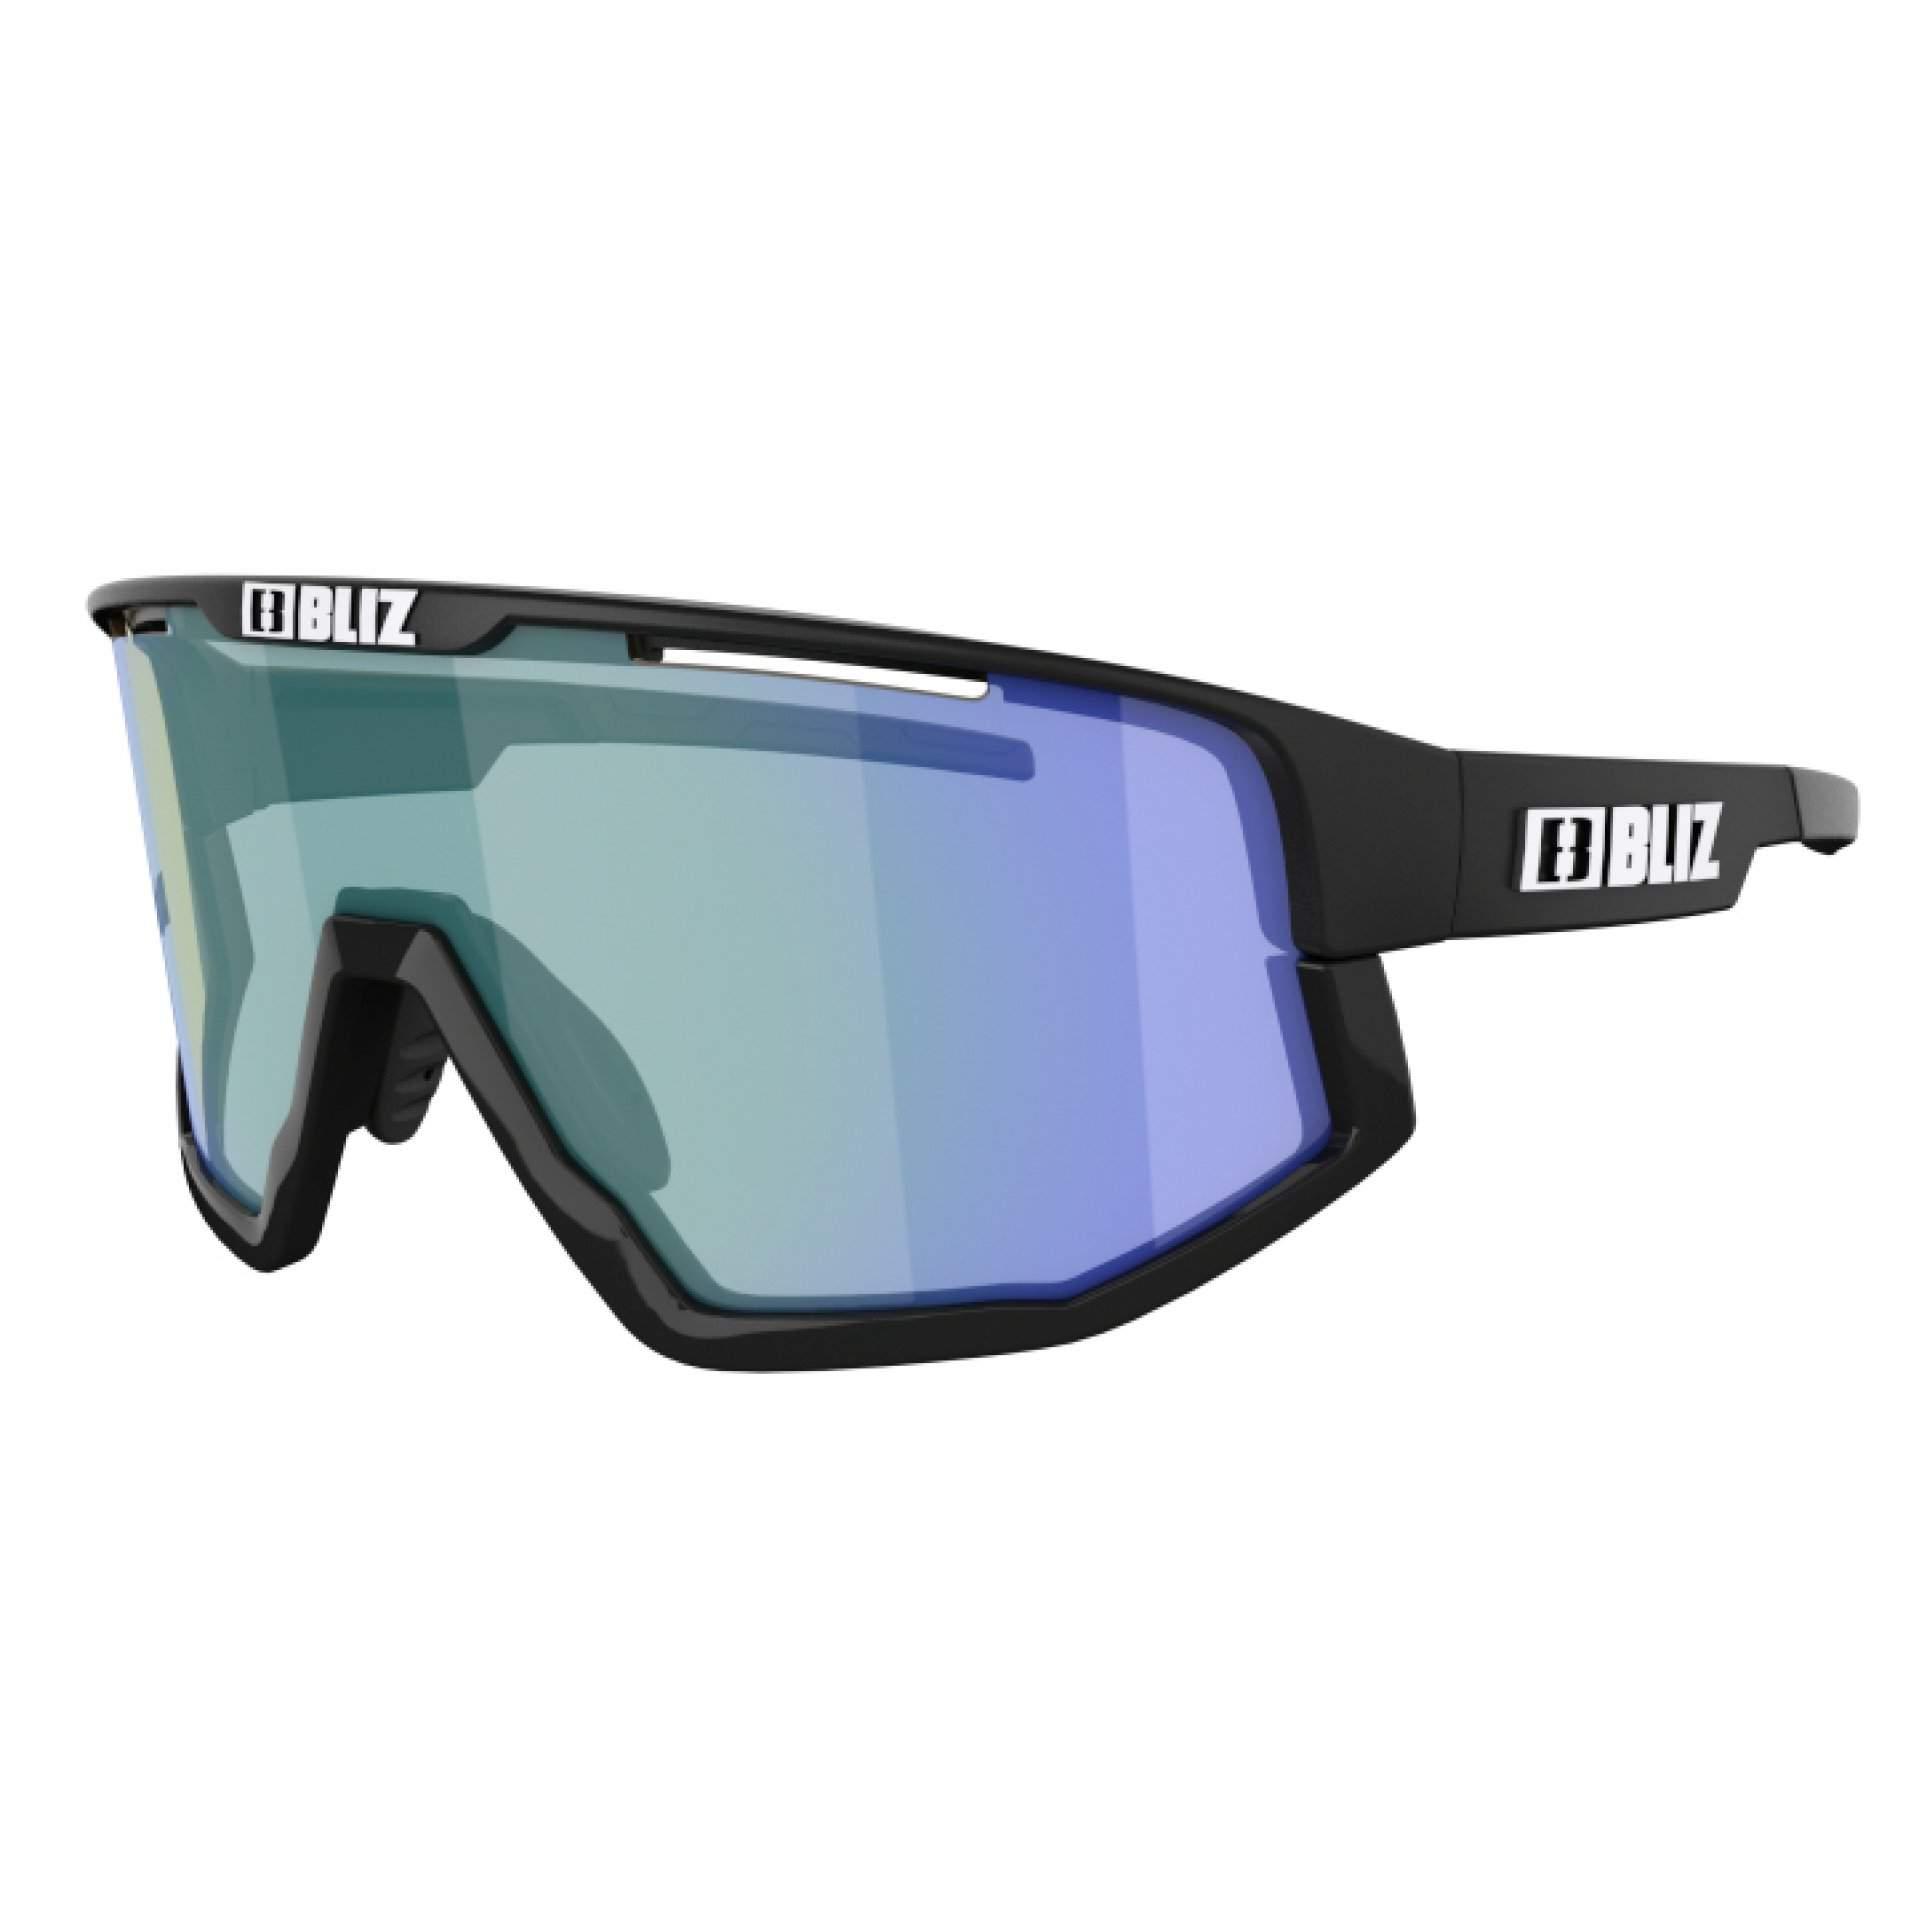 OKULARY BLIZ VISION NANO MATT BLACK|BROWN W BLUE MULTI 52101|13P